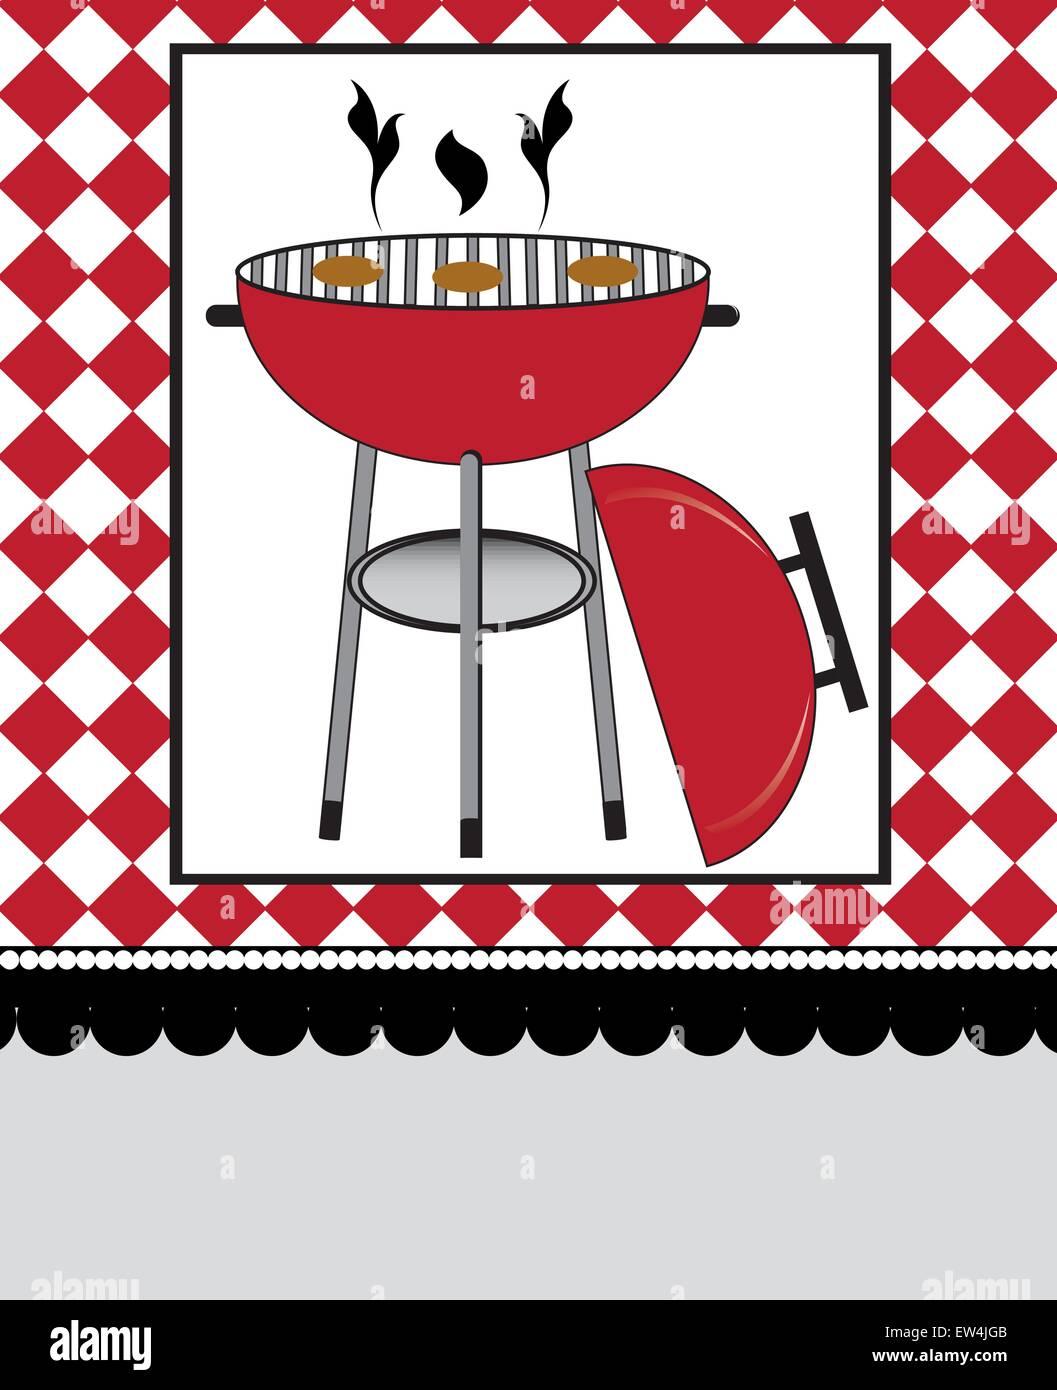 Vintage Barbecue Party Invitation Card Stock Photos & Vintage ...